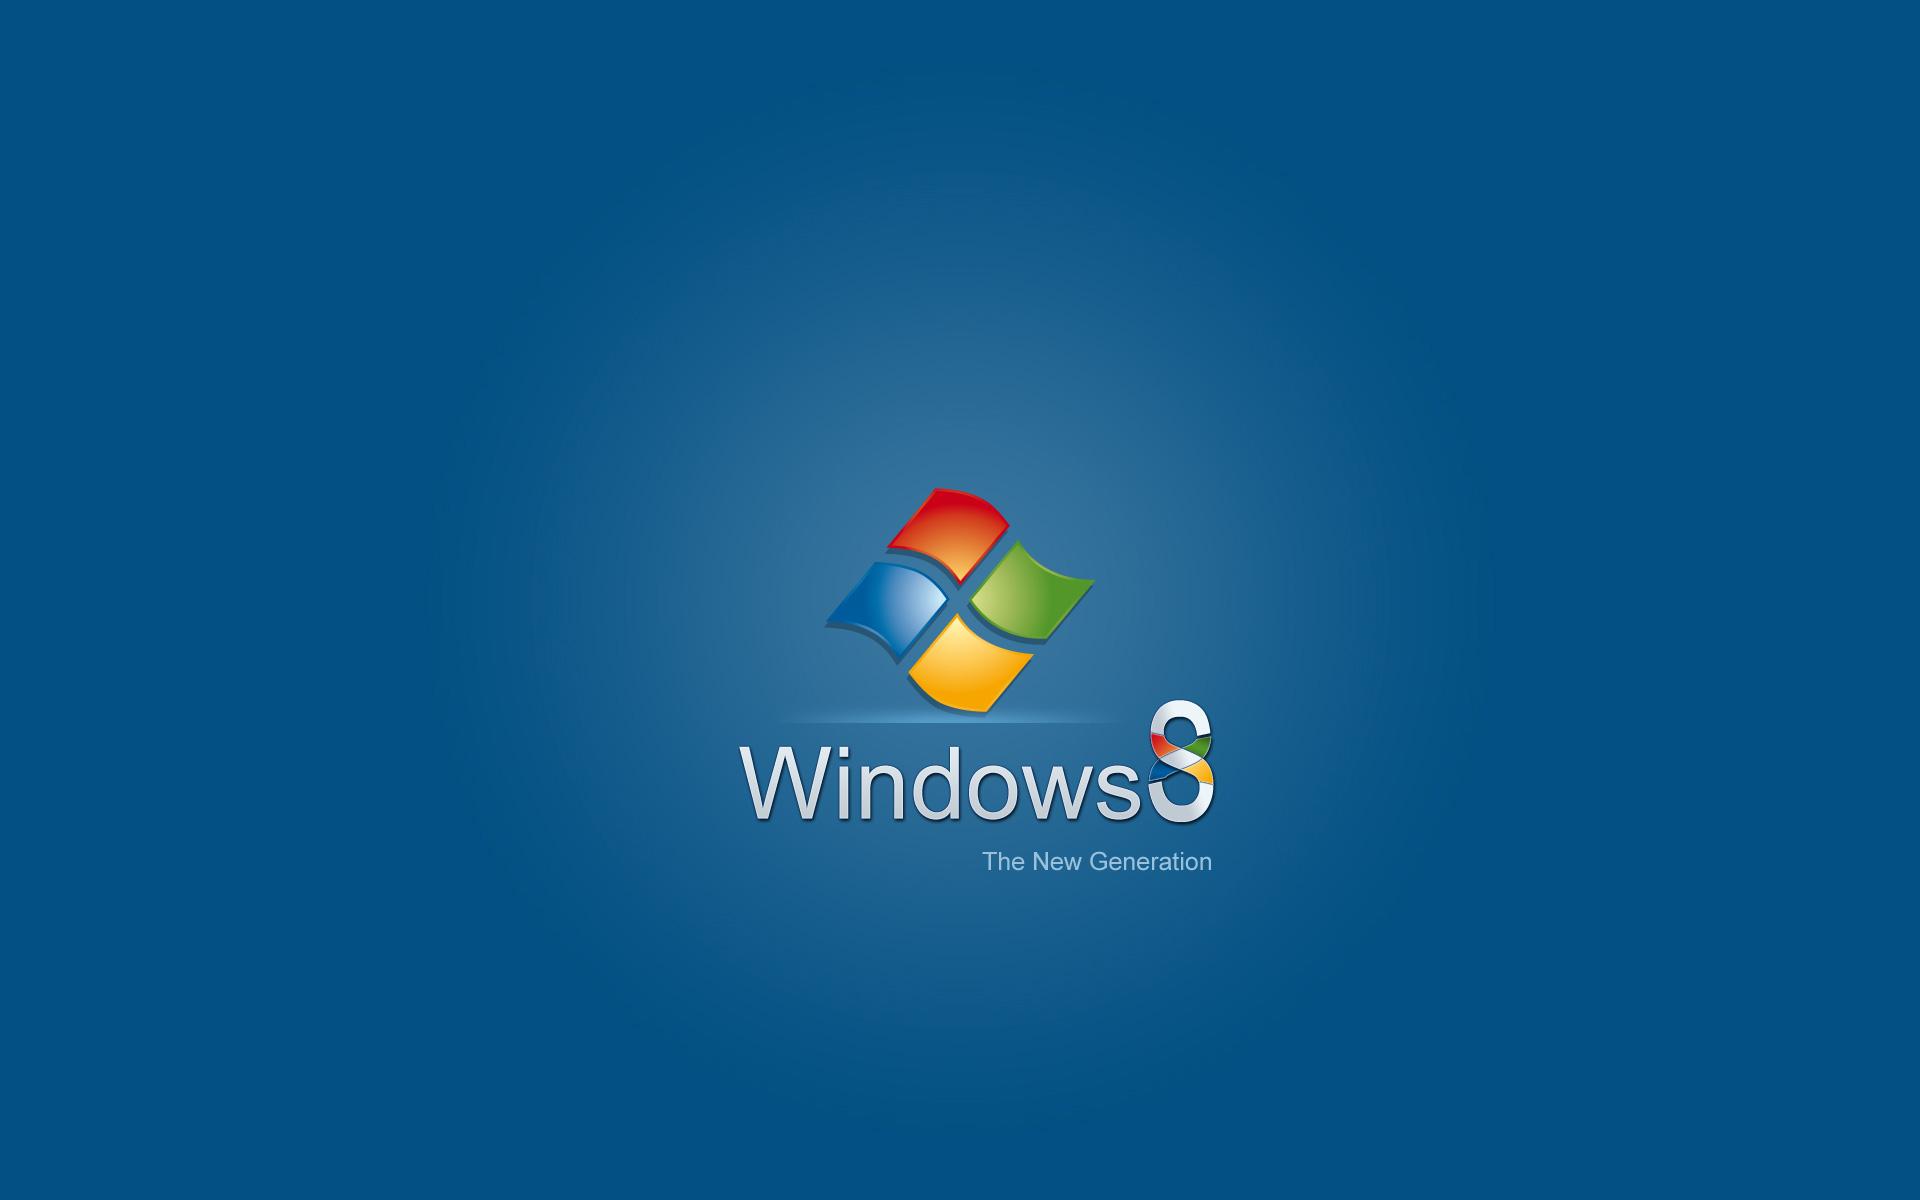 Windows 8 New Generation